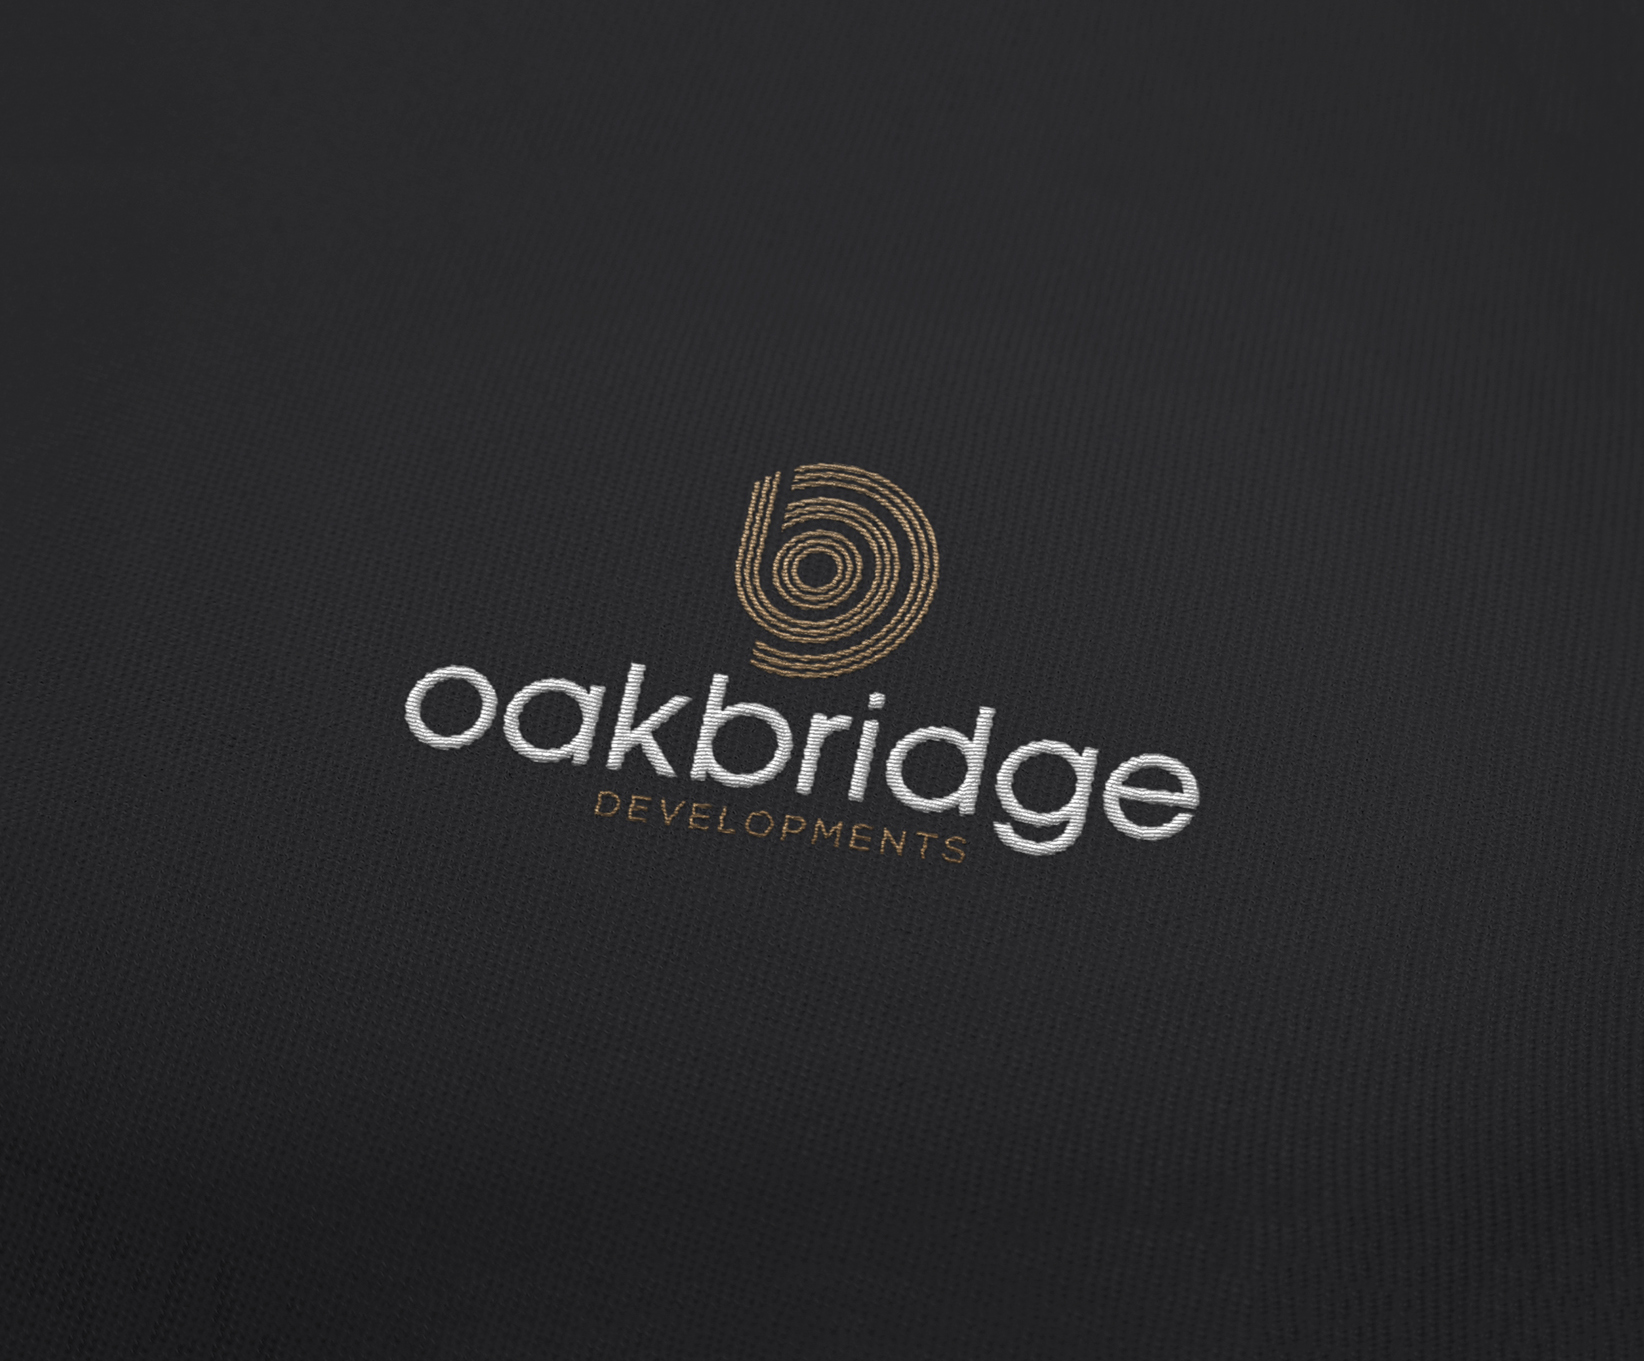 oakbridge logo embroidered